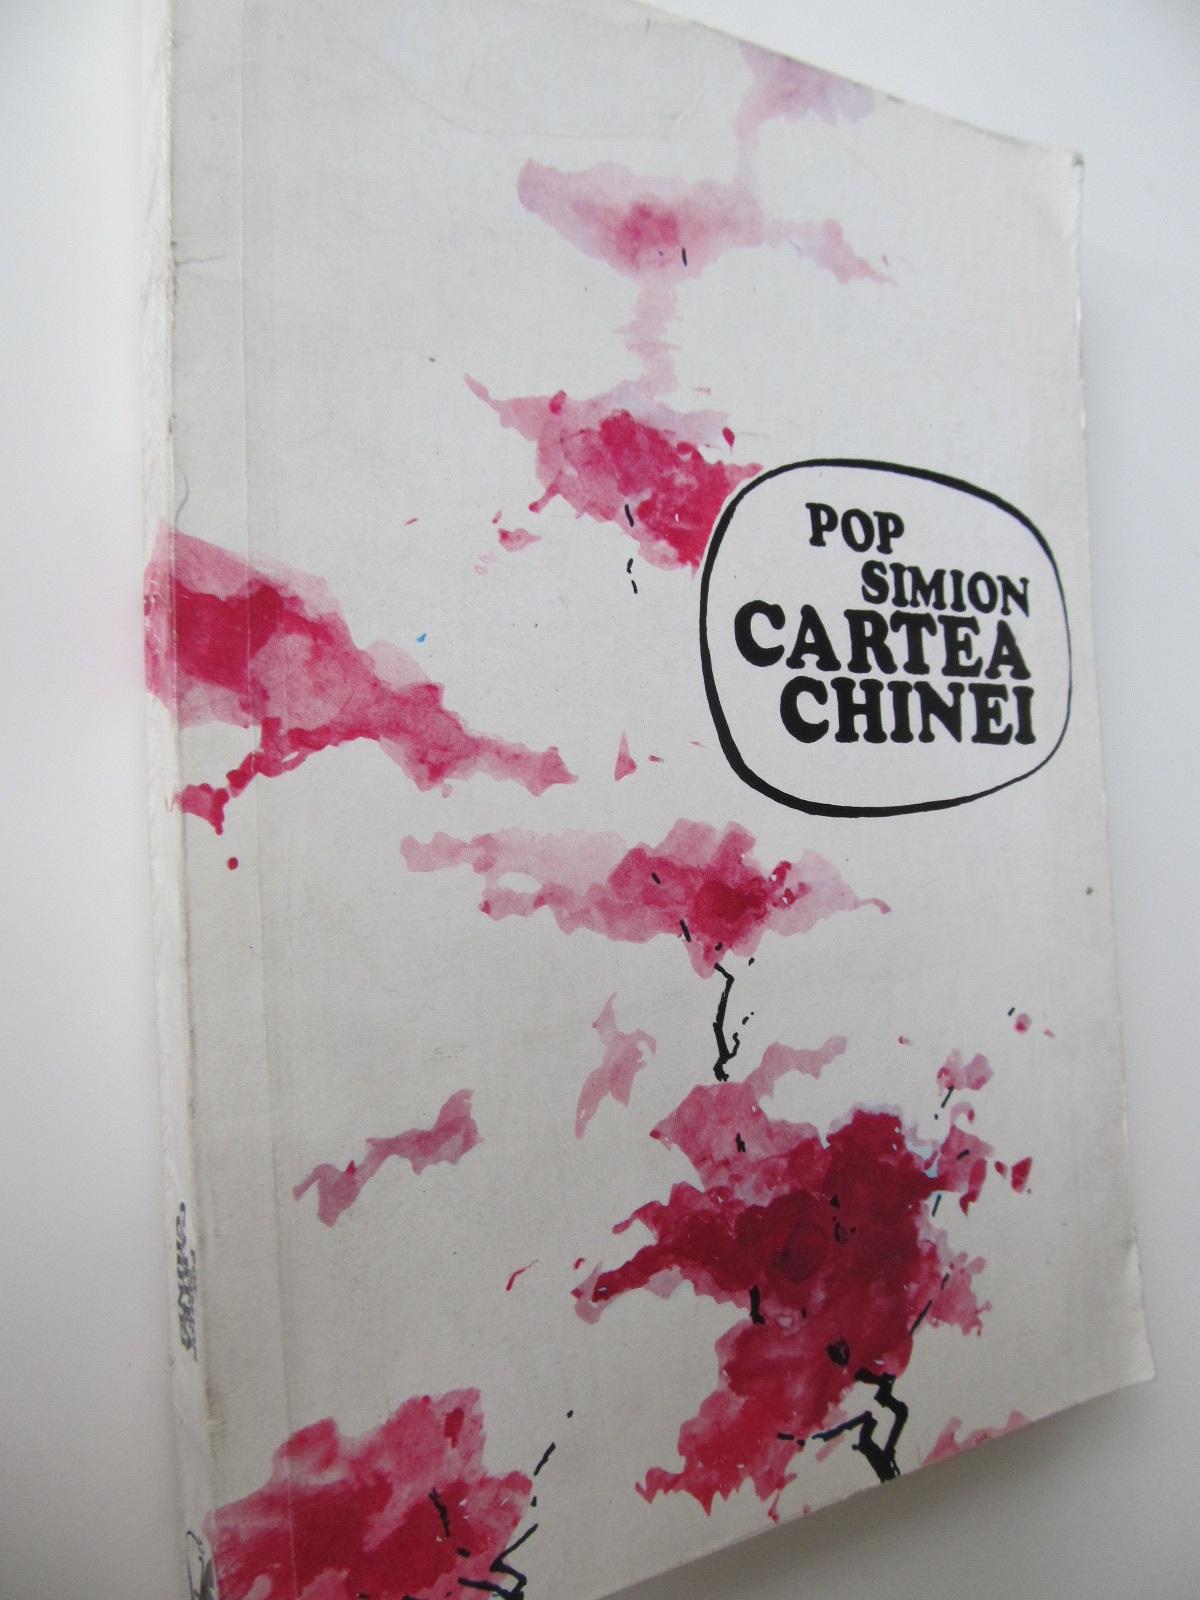 Cartea Chinei - Pop Simion | Detalii carte